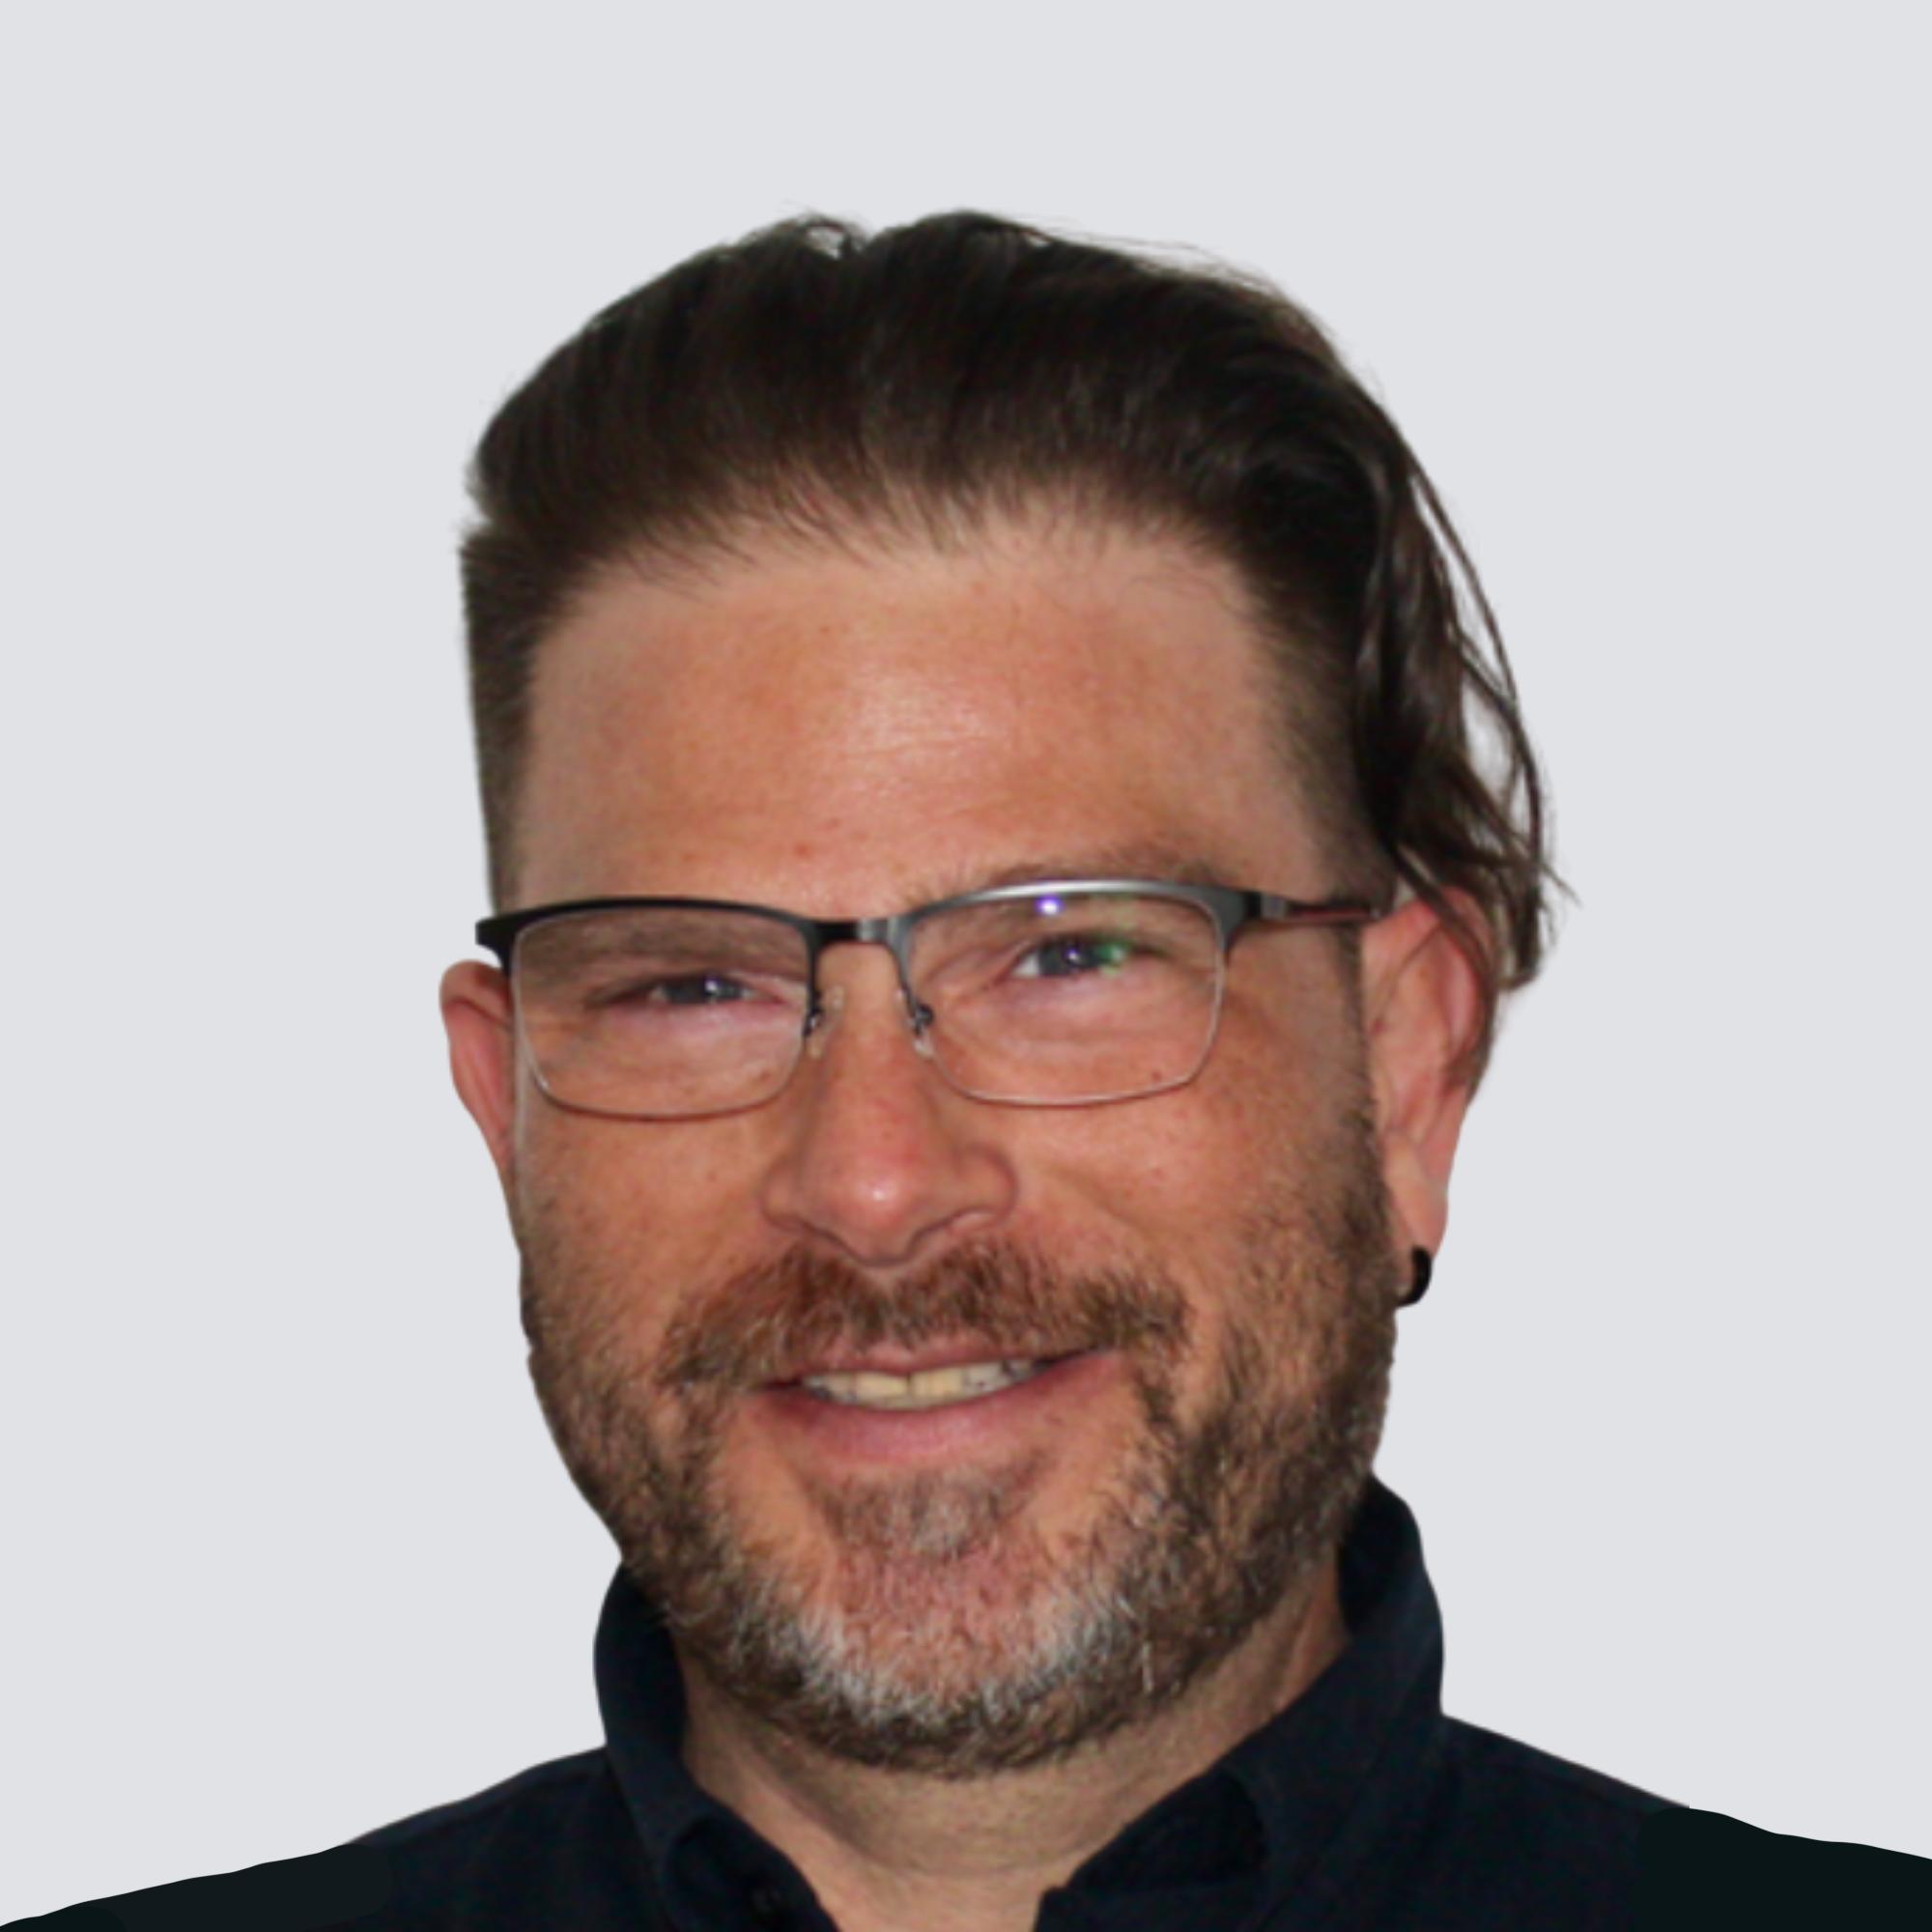 Kirk Demerling, Sampler's Director of Product Development